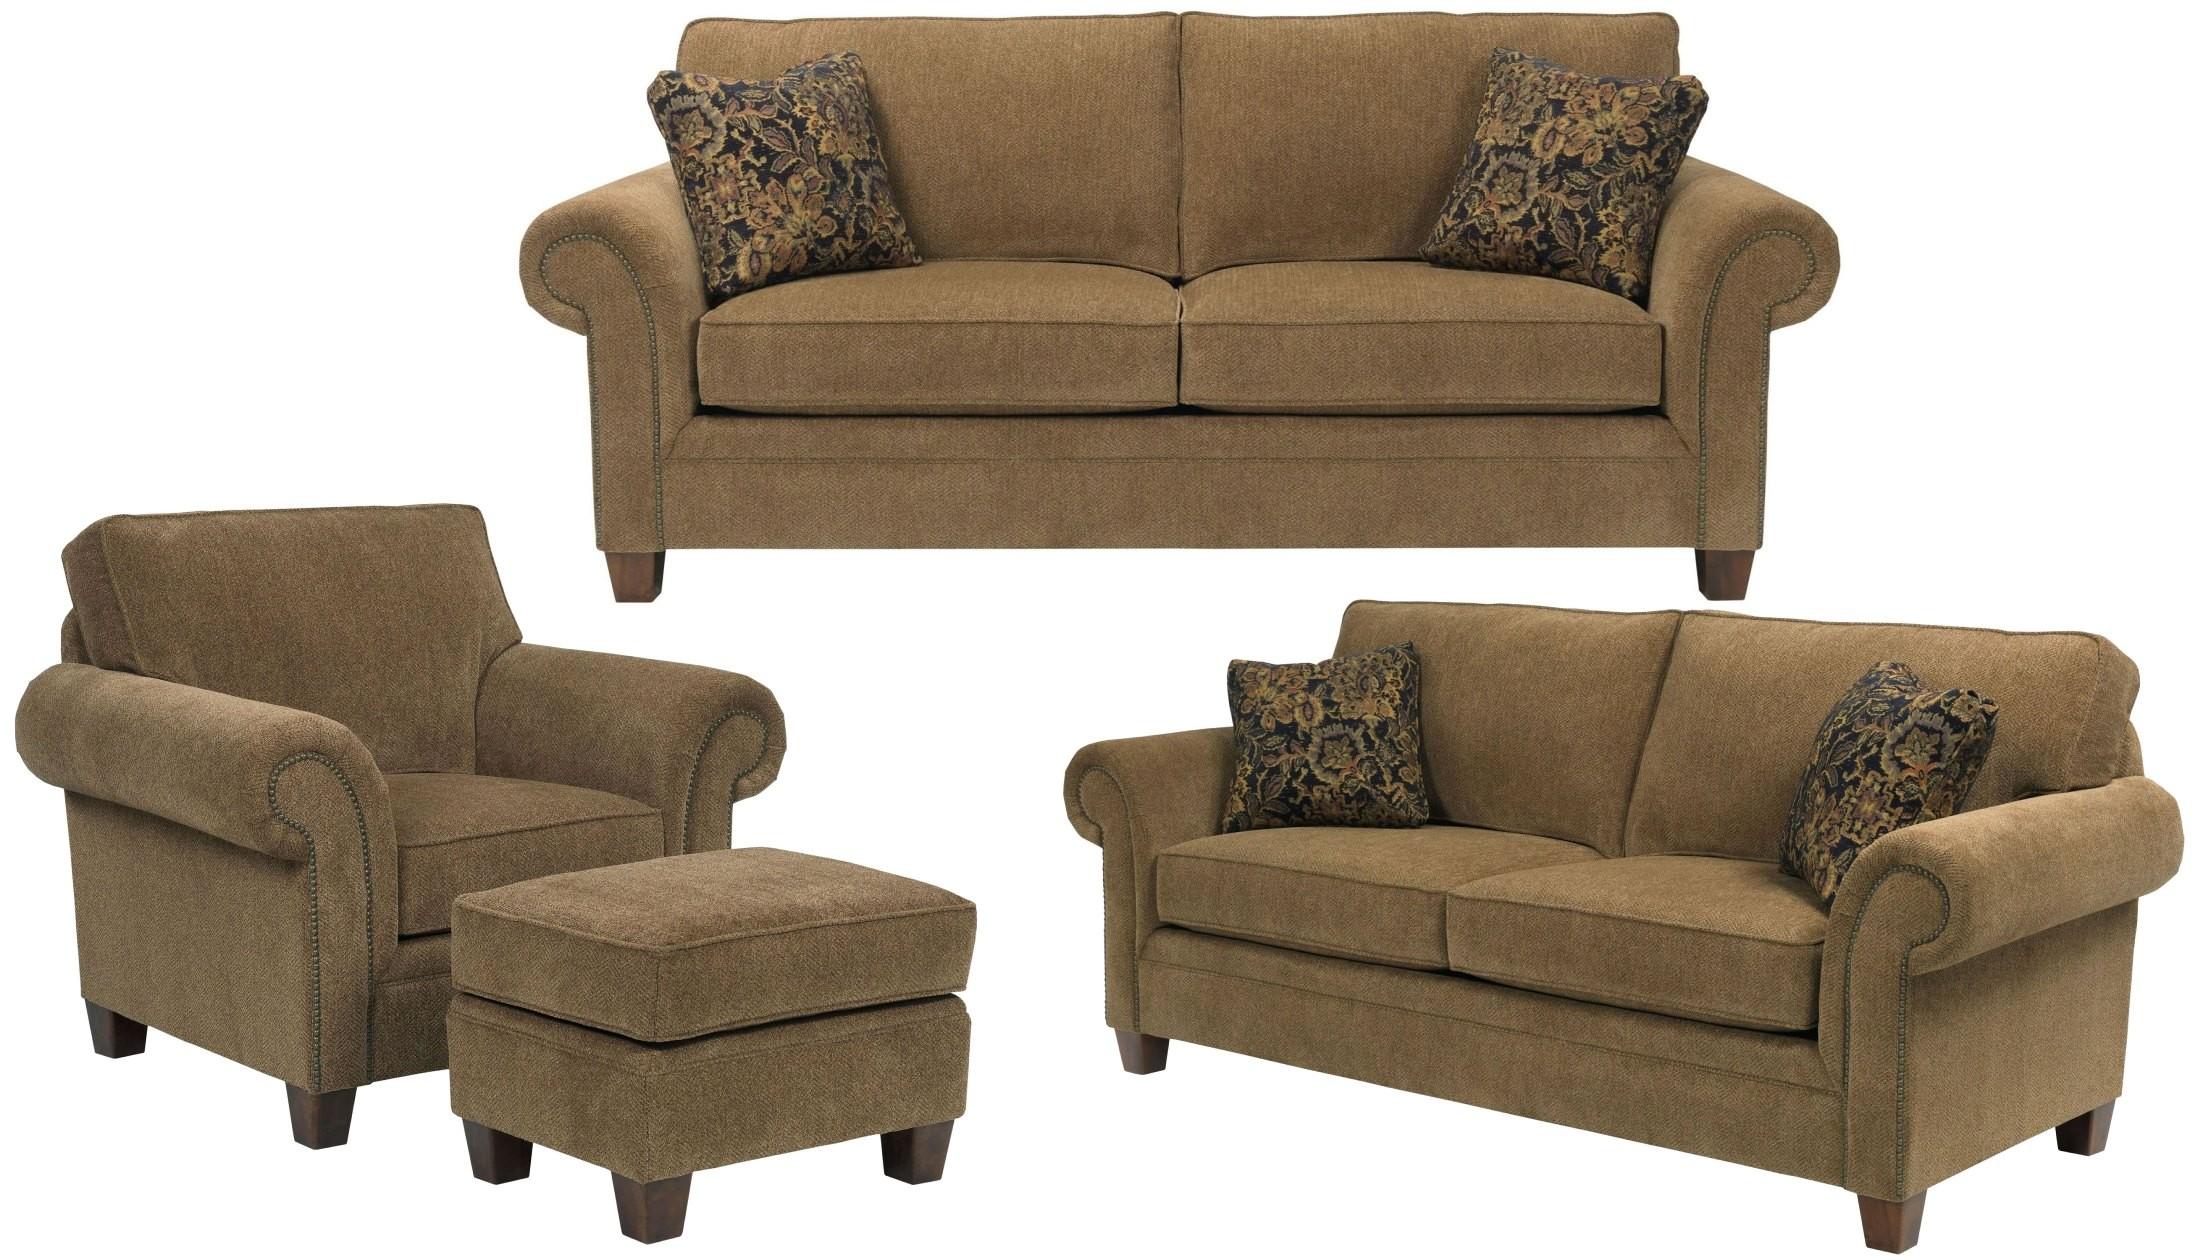 travis walnut chenille fabric living room set from. Black Bedroom Furniture Sets. Home Design Ideas